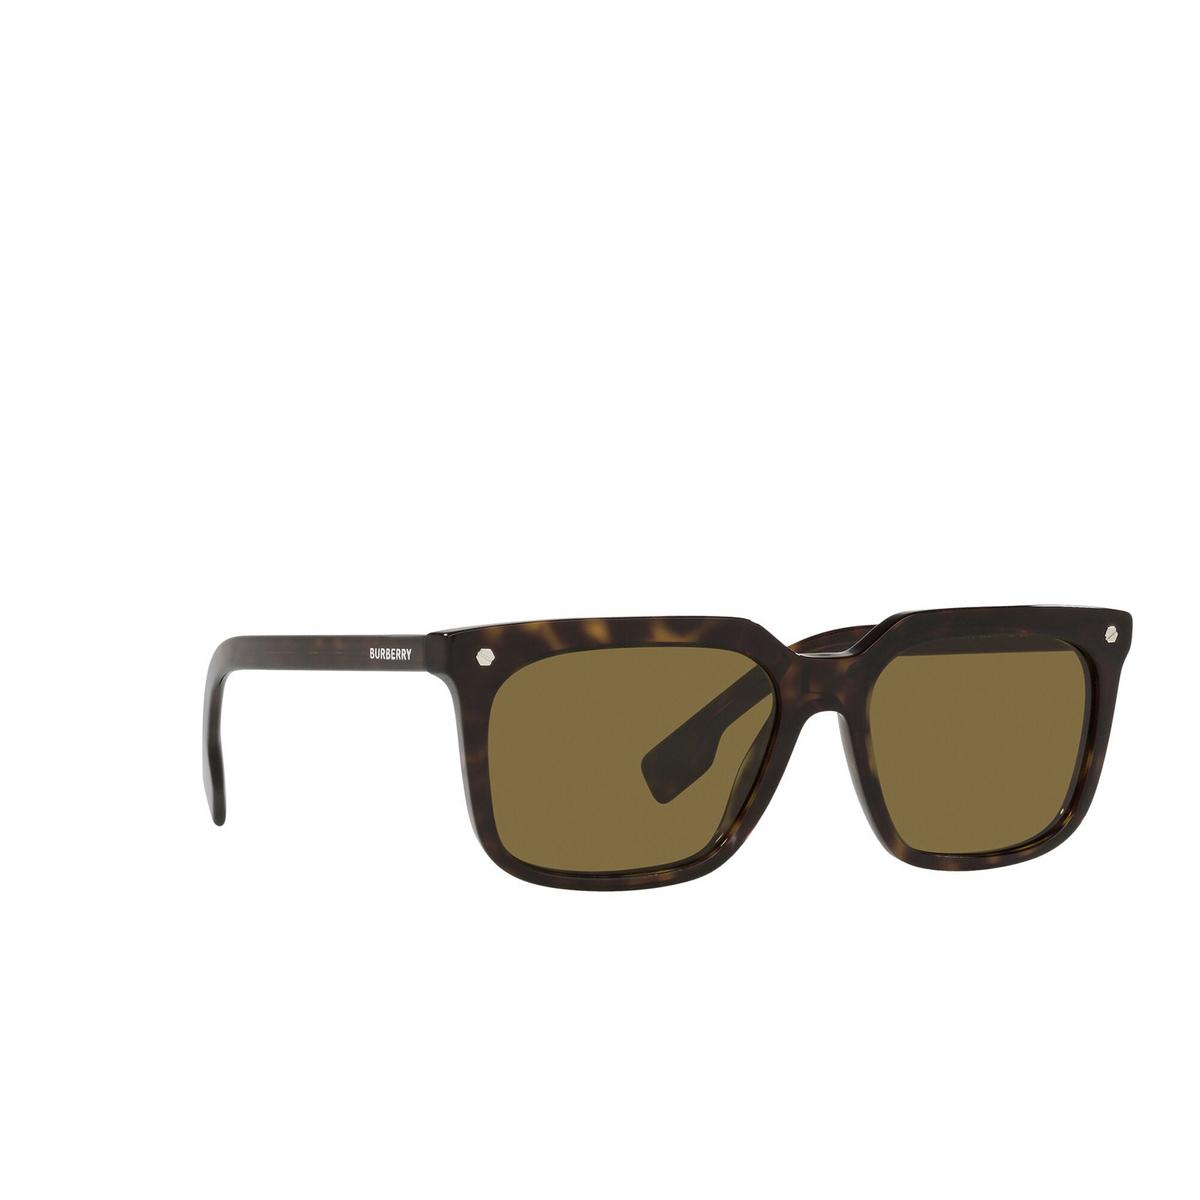 Burberry® Square Sunglasses: Carnaby BE4337 color Dark Havana 300273 - three-quarters view.